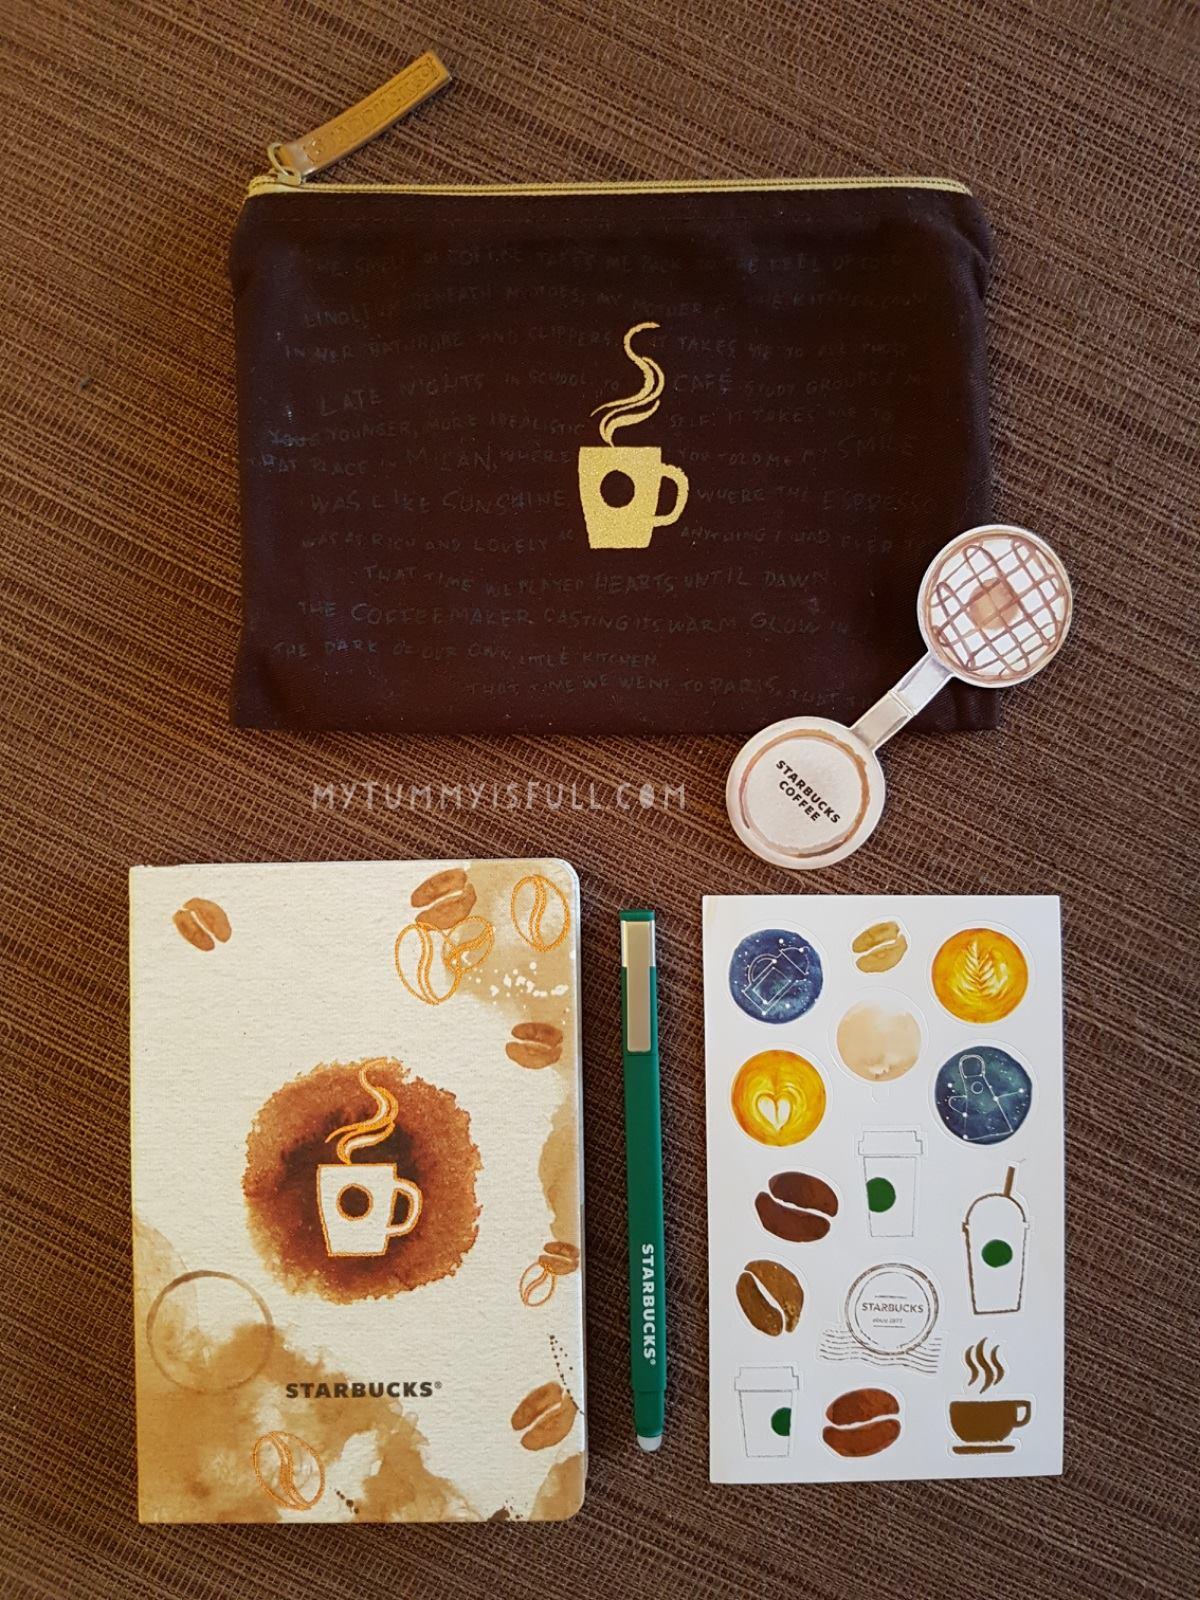 starbucks coffee stain planner 2017